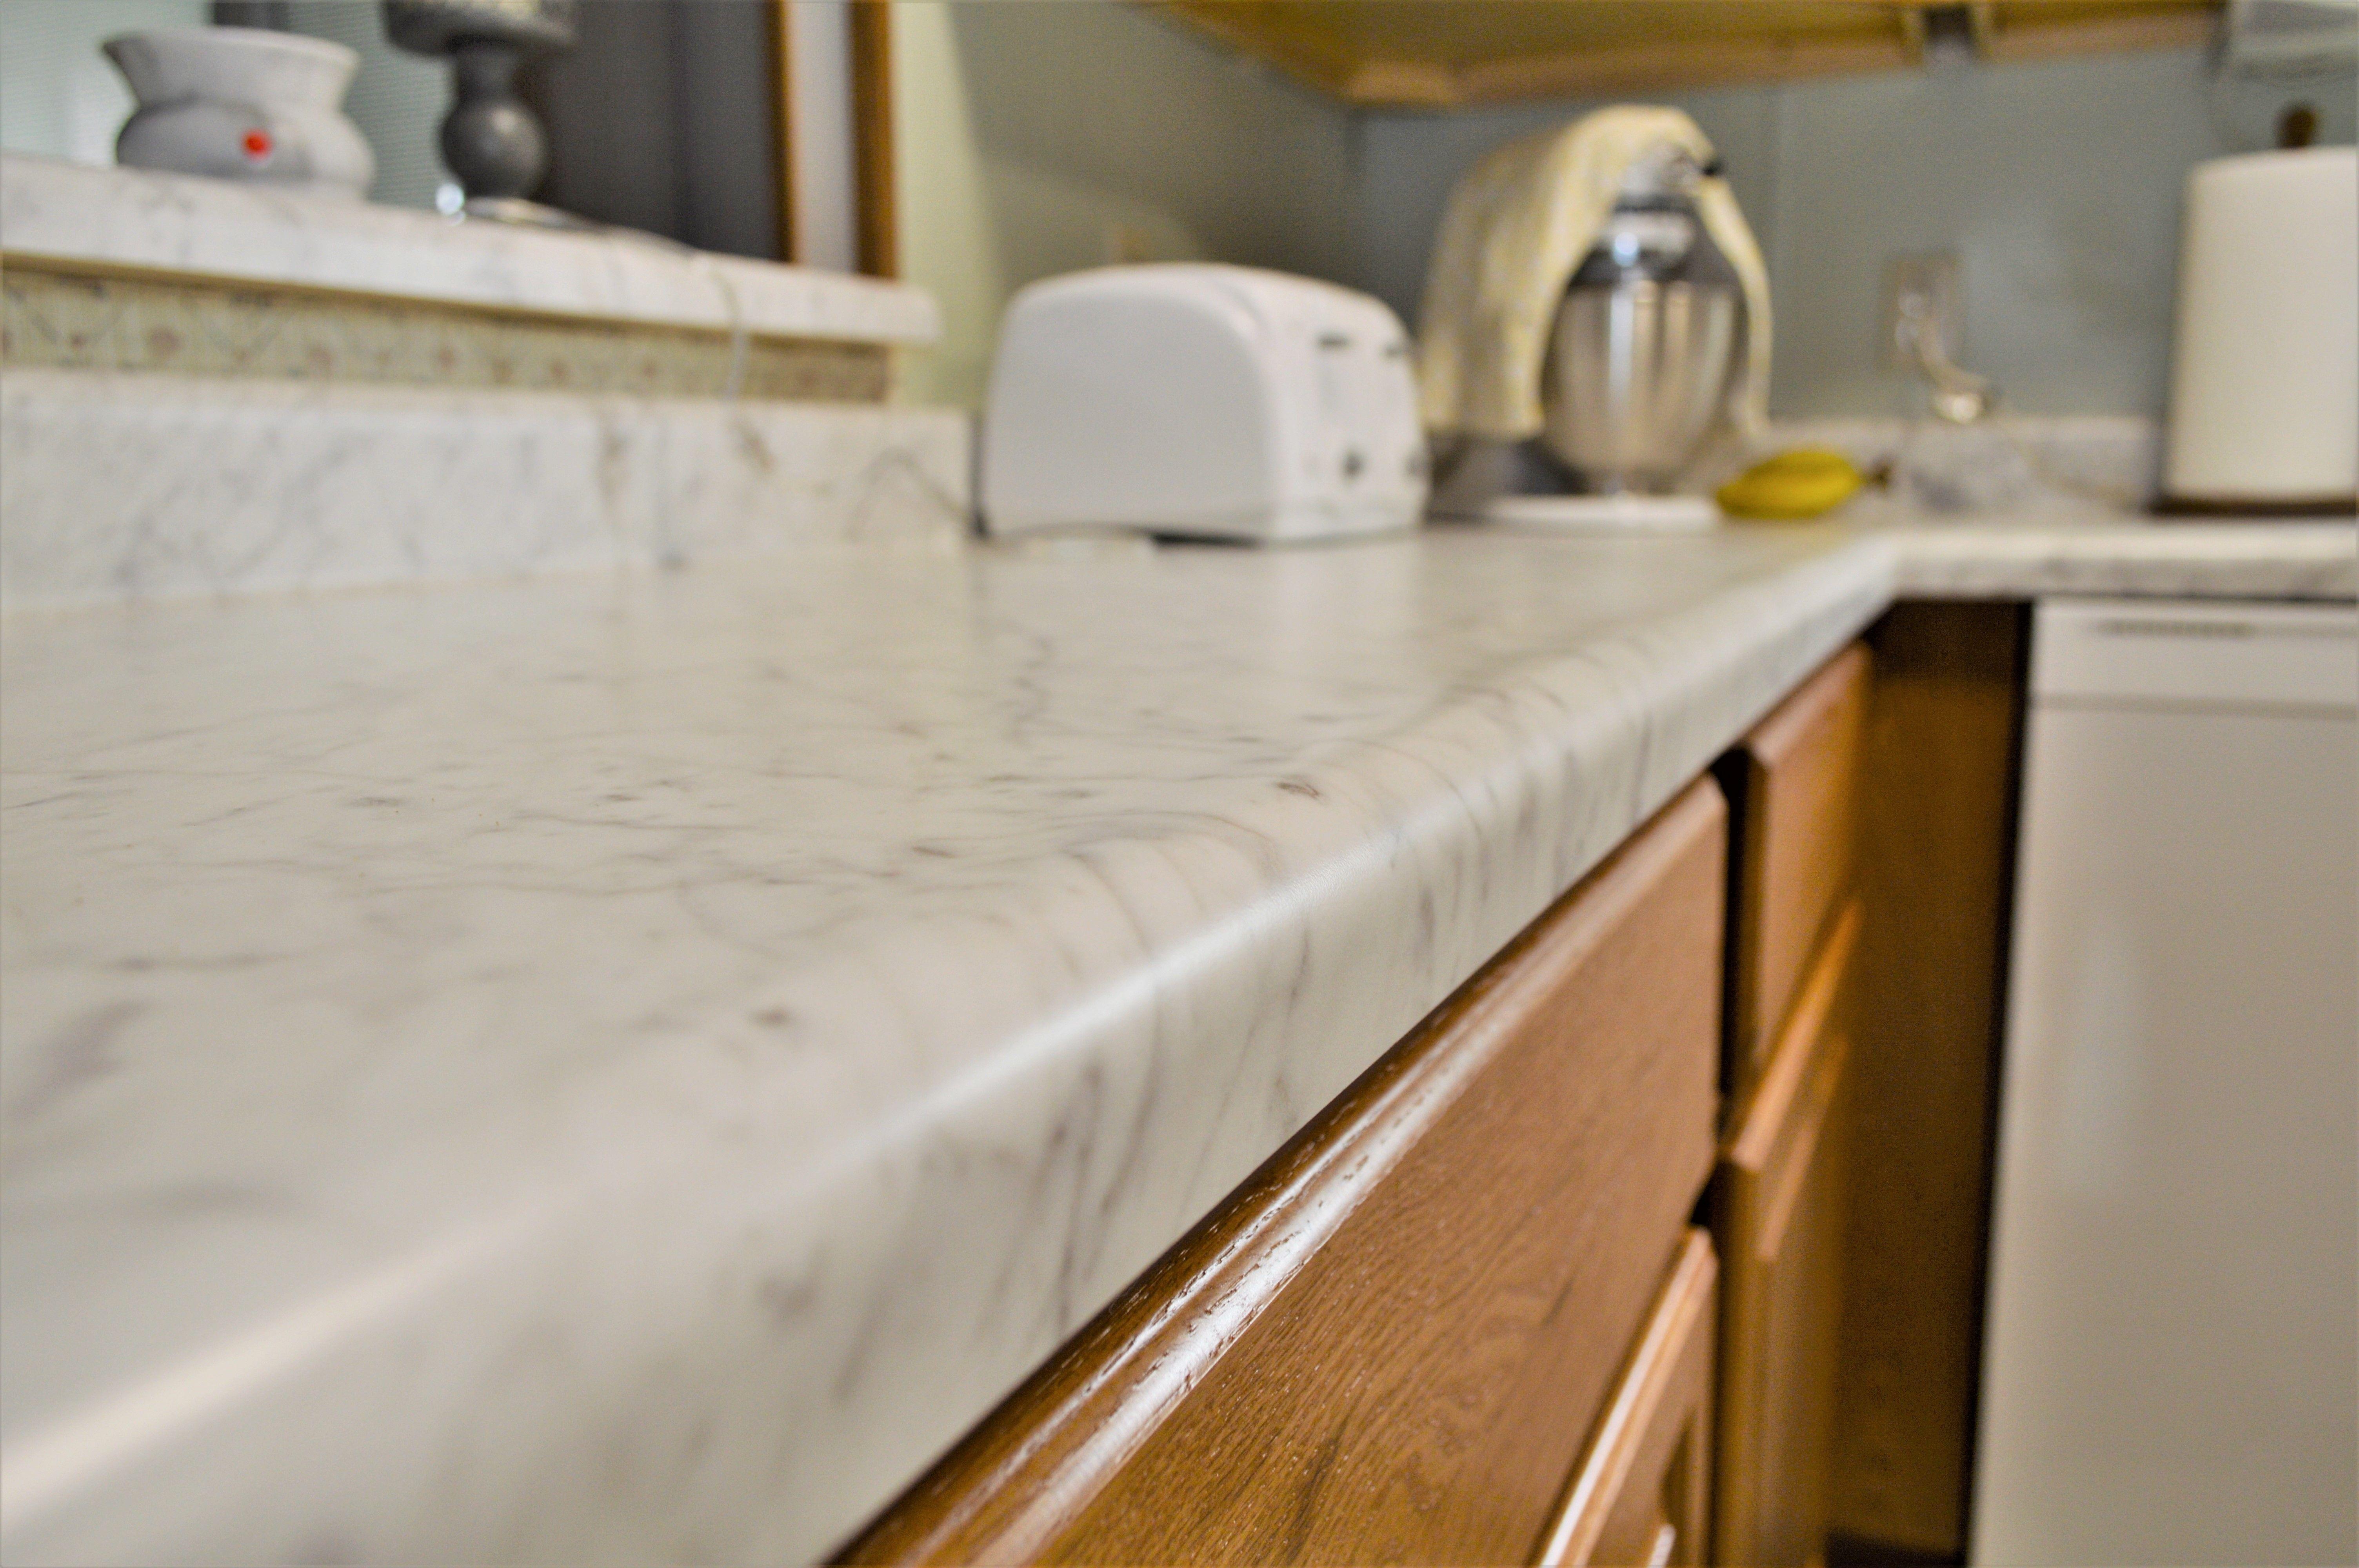 Laminate Countertop Ultra Form Edge Detail Coved Backsplash